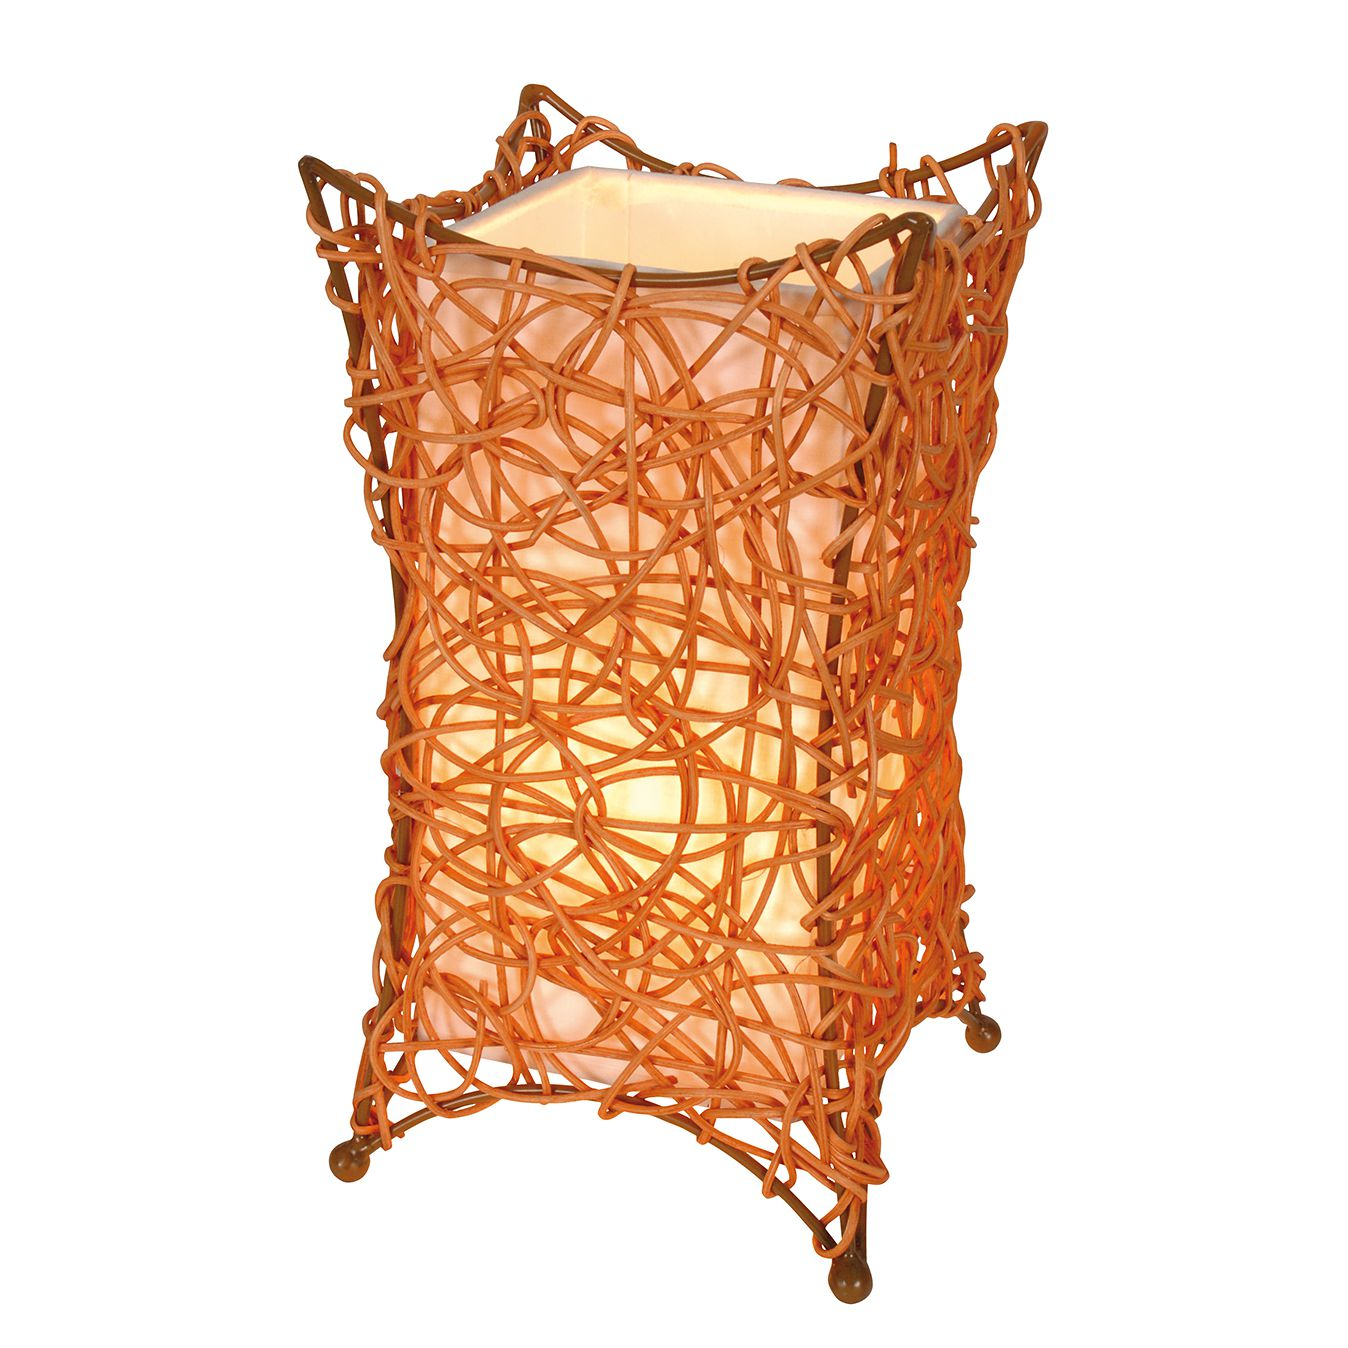 EEK A++, Korb-Tischleuchte Hurly-Burly Orange - Geflecht - 1-flammig, Näve